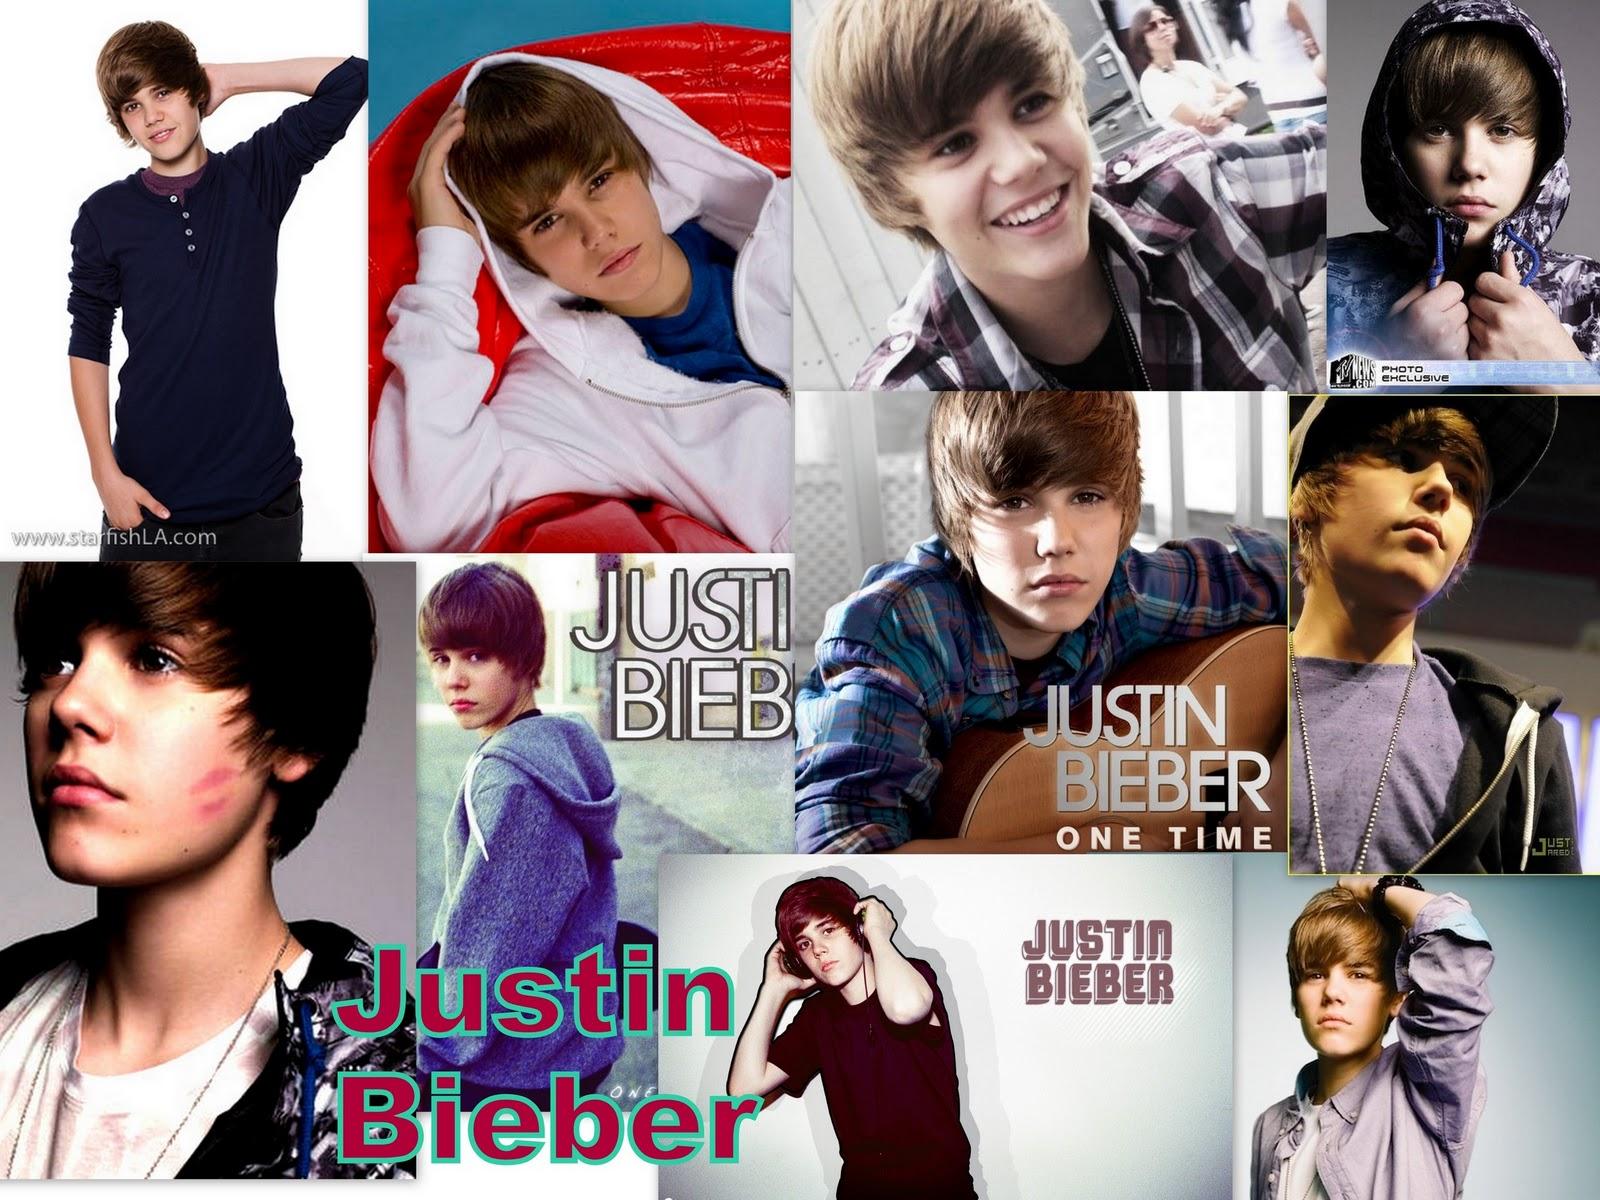 Justin Bieber 2013 Cool Wallpaper: Pic New Posts: Justin Bieber Wallpaper For Pc